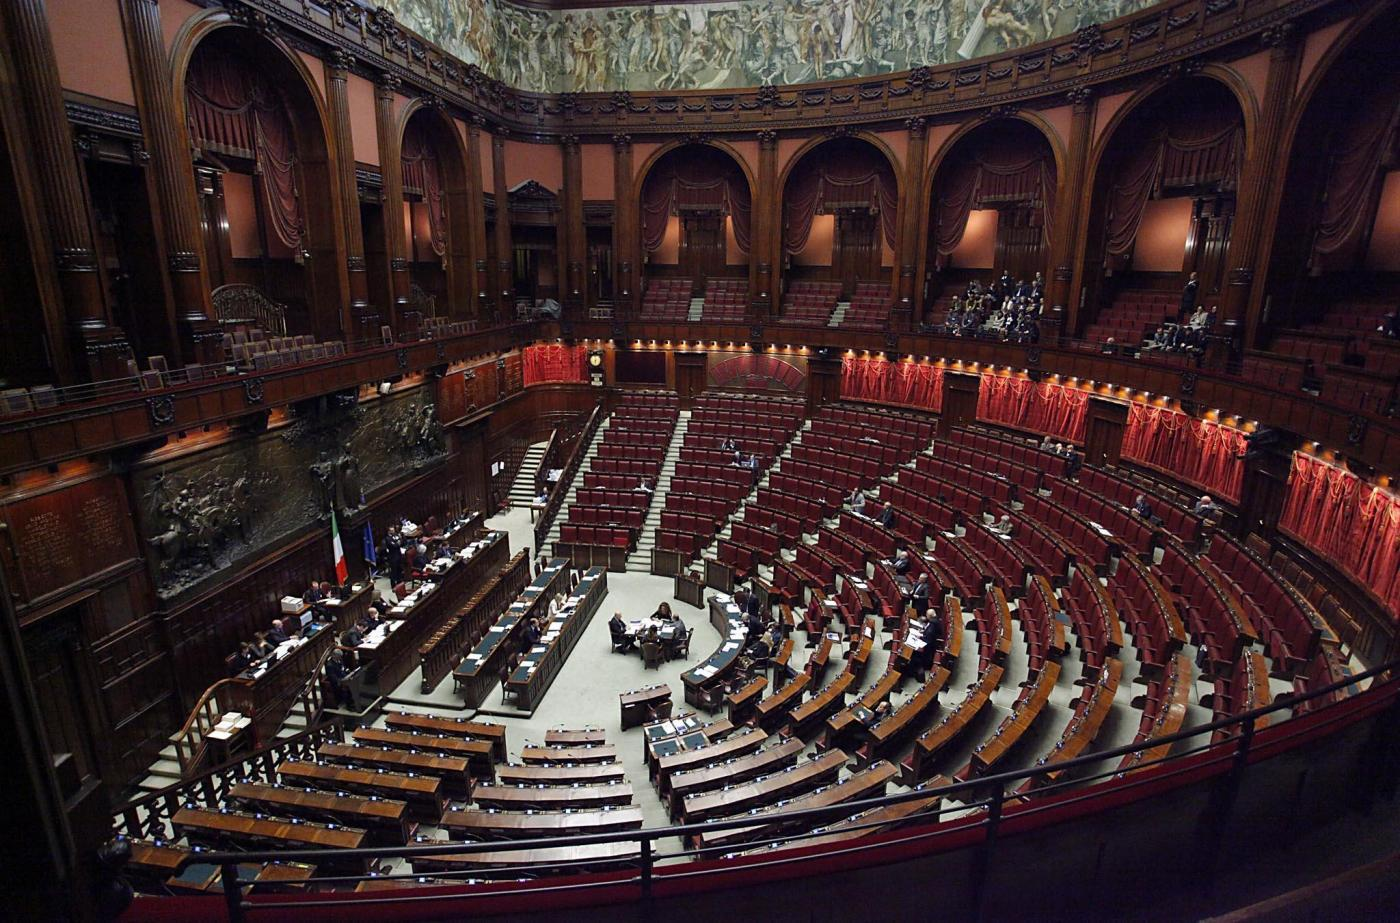 I campioni di assenteismo in parlamento i verdiniani e i for Camera dei deputati